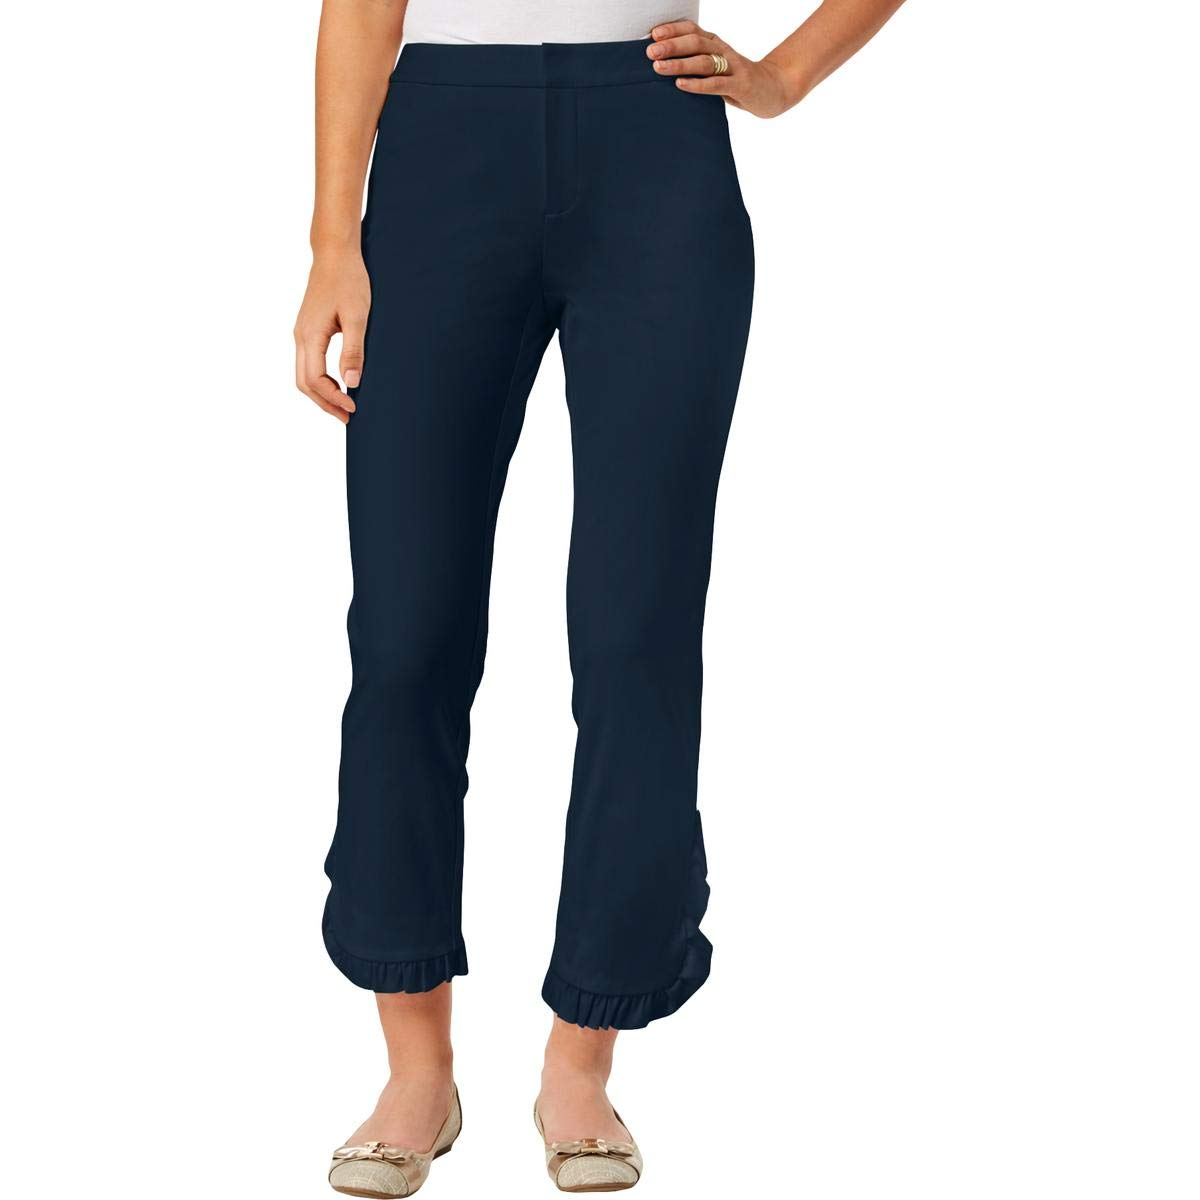 Intrepid blueee 8 Charter Club Womens Newport Slim Leg Ruffled Cropped Pants